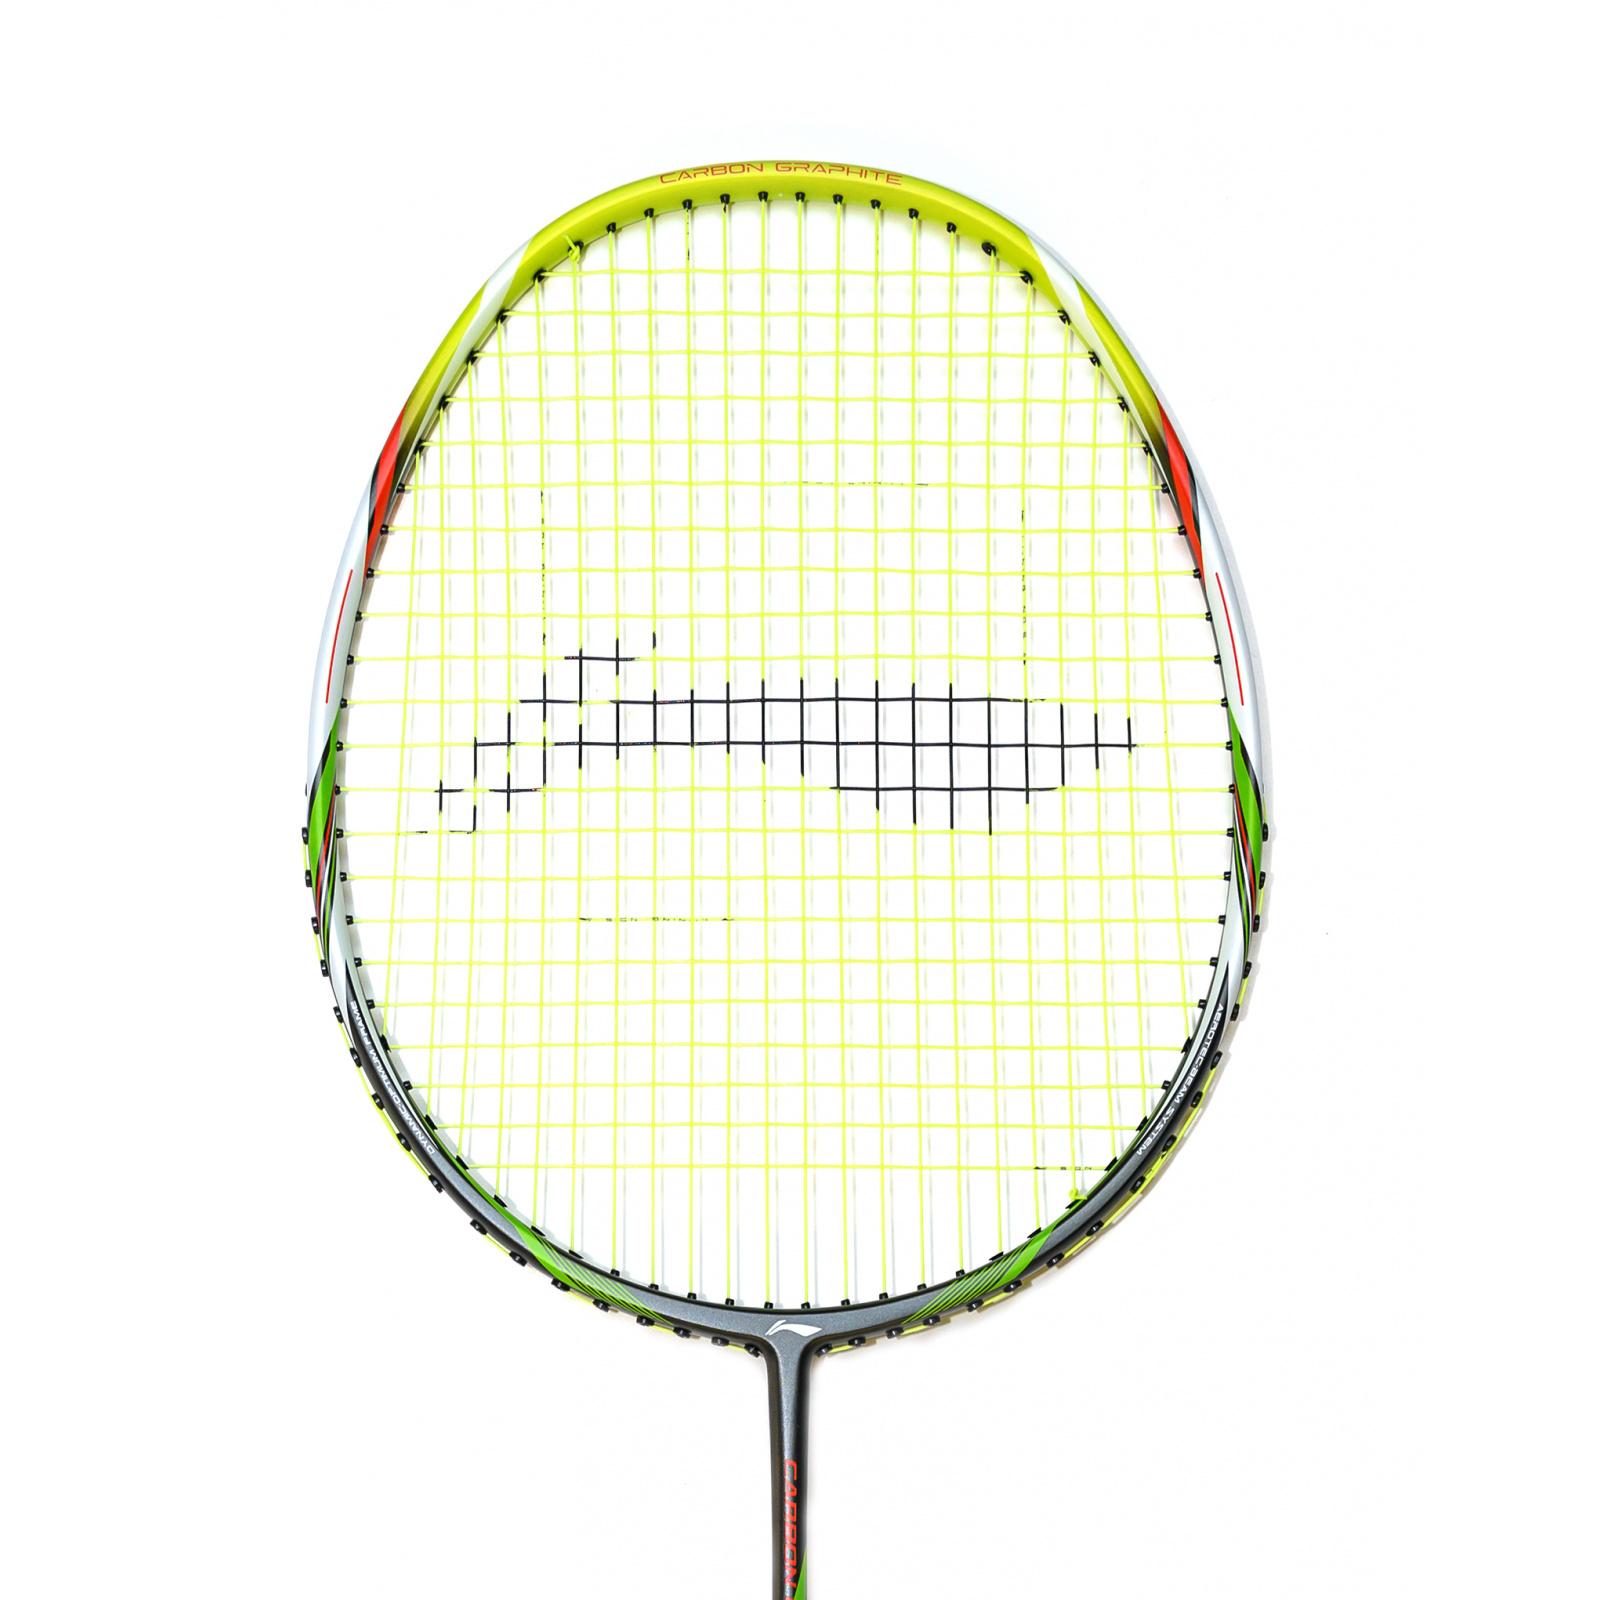 https://www.badec.store/produkty_img/badmintonova-raketa1581618446L.jpg